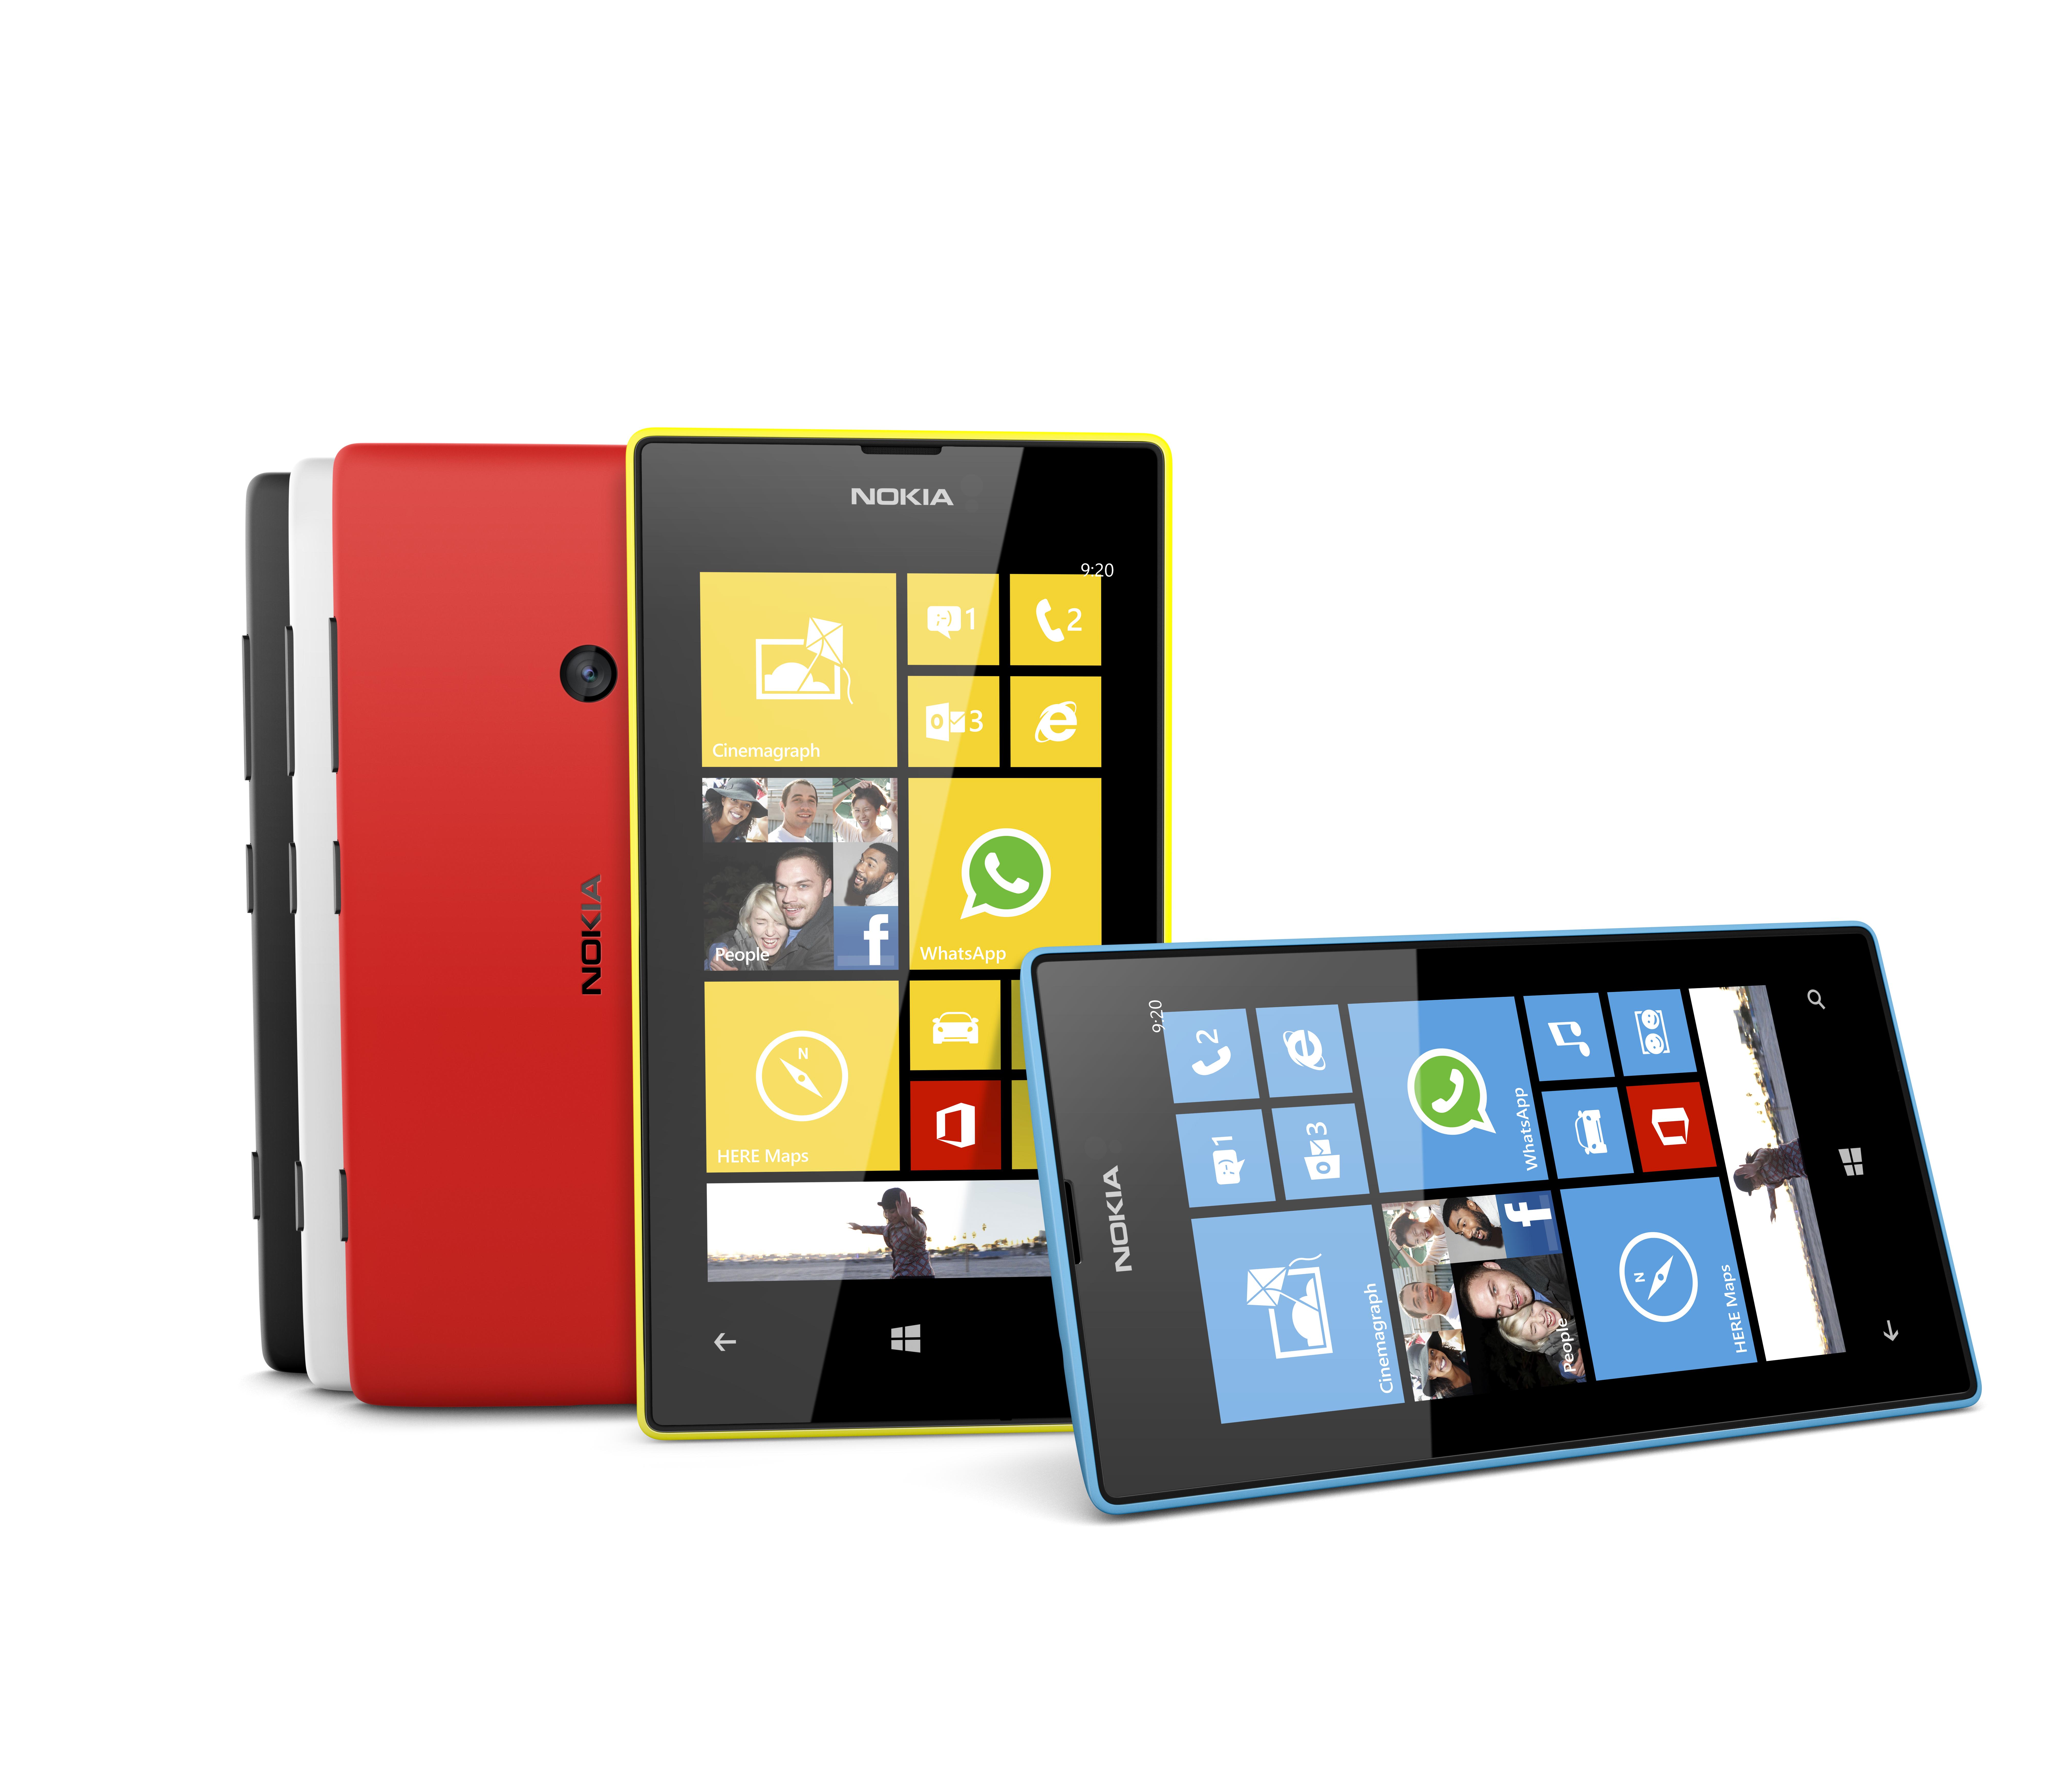 Photo Nokia Lumia 520 Color Range 2 Jpg 8000 X 7000